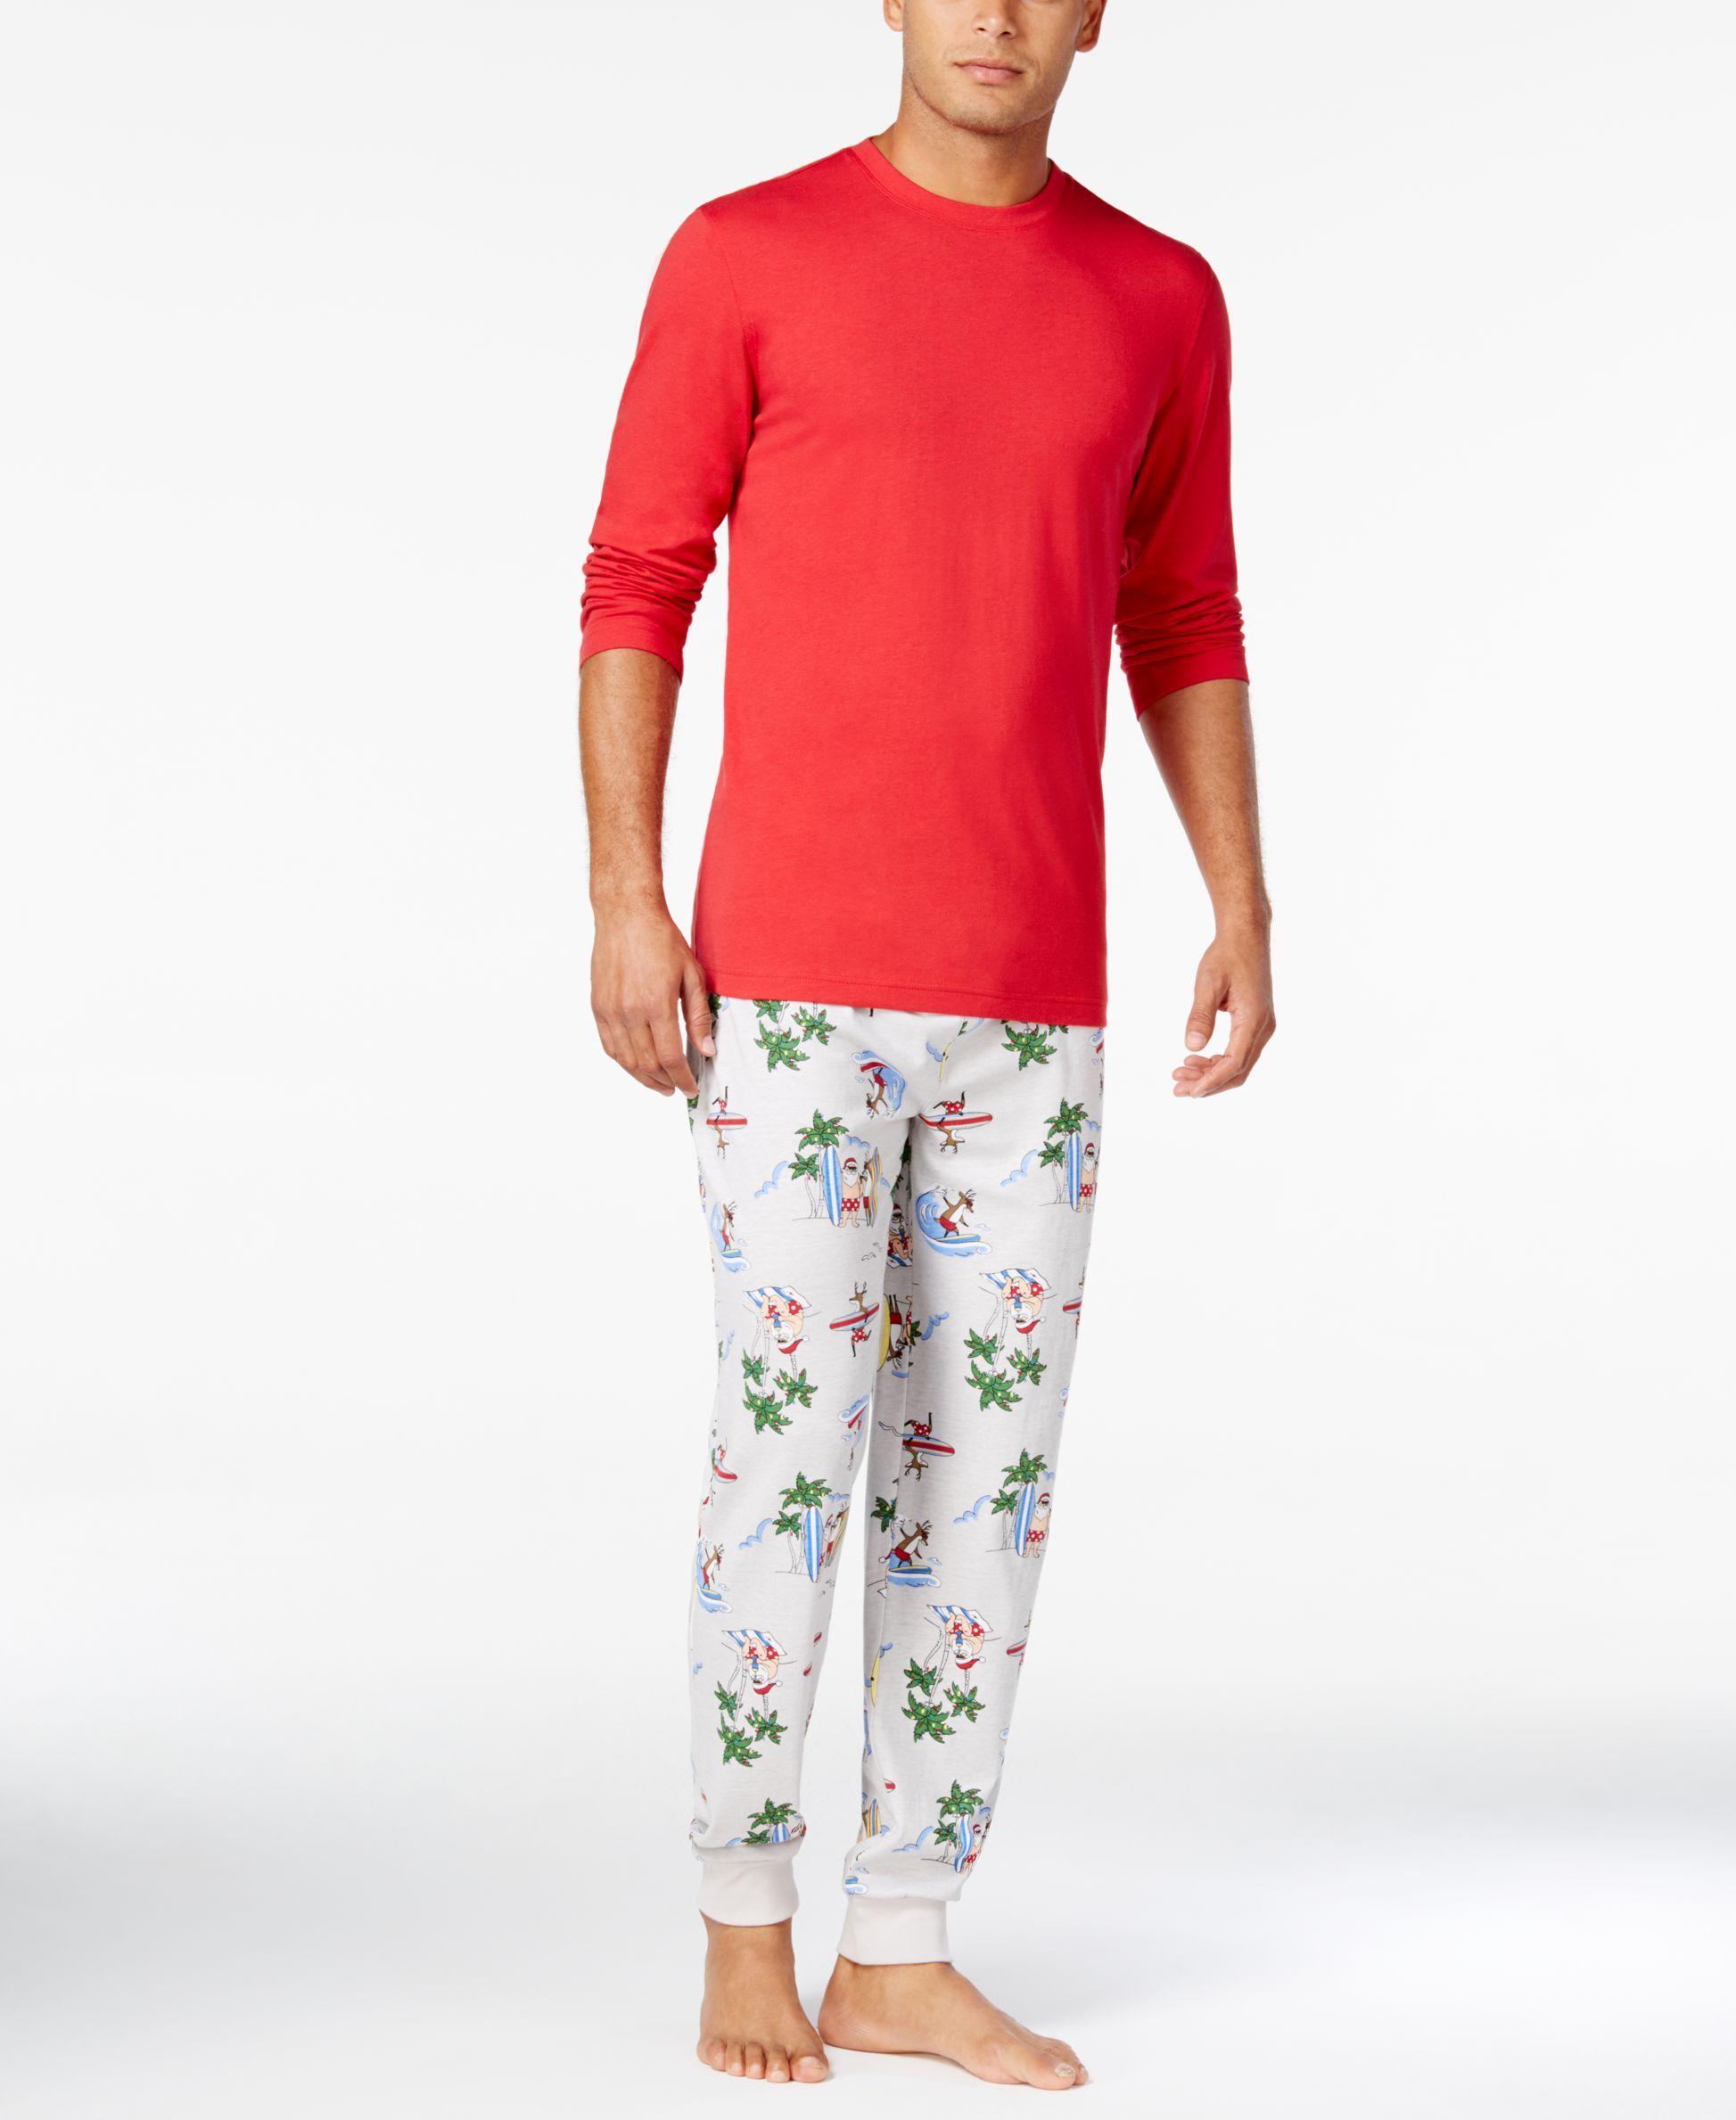 Family Pajamas Men's Tropical Santa Mix-It Pajama Set, Only at Macy's